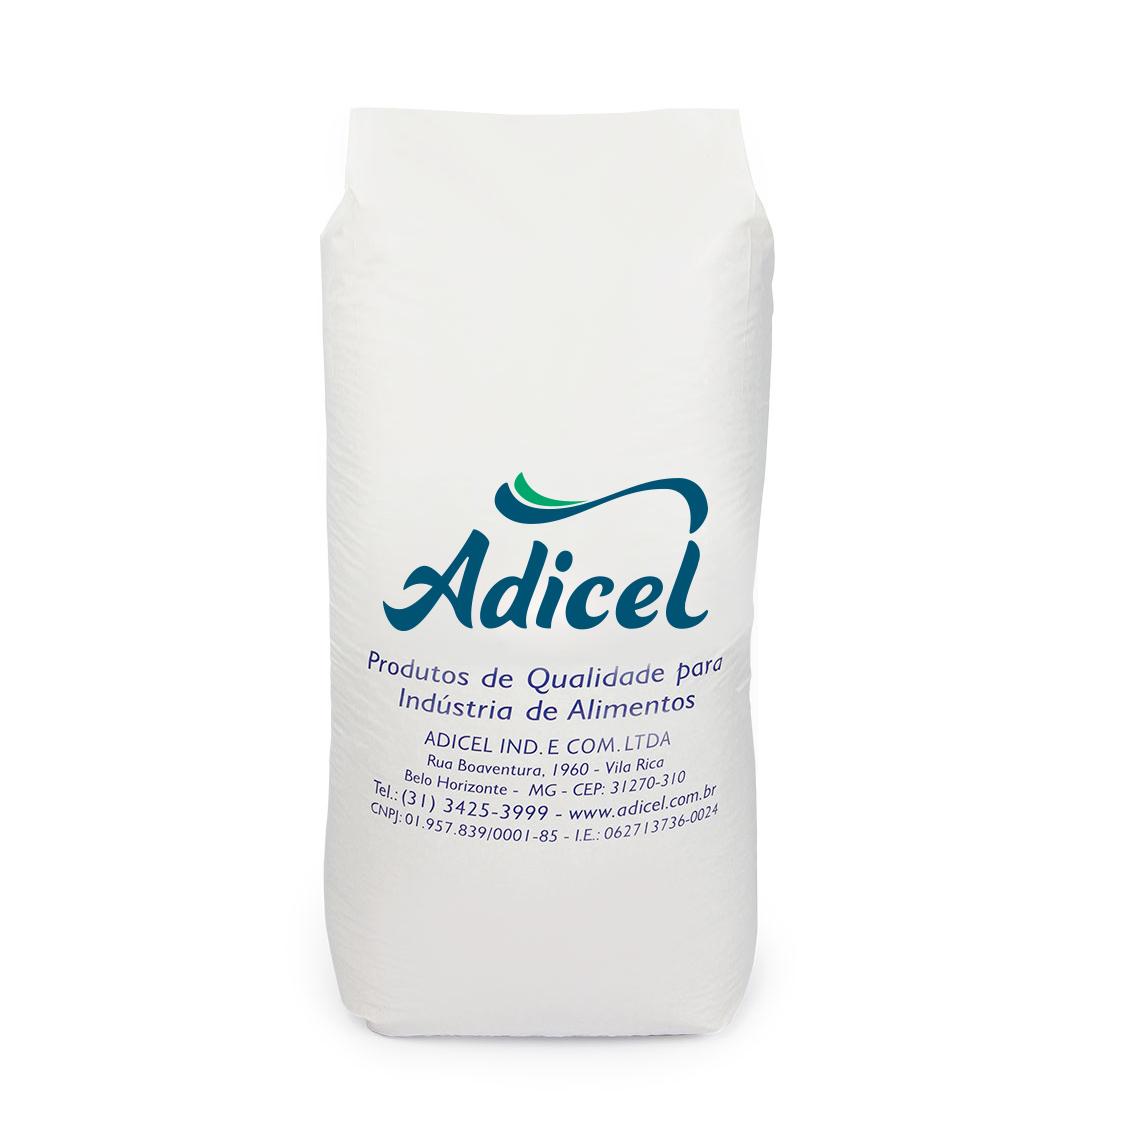 Cacau Em Pó Natural 8% Fralía Adicel - 25 Kg